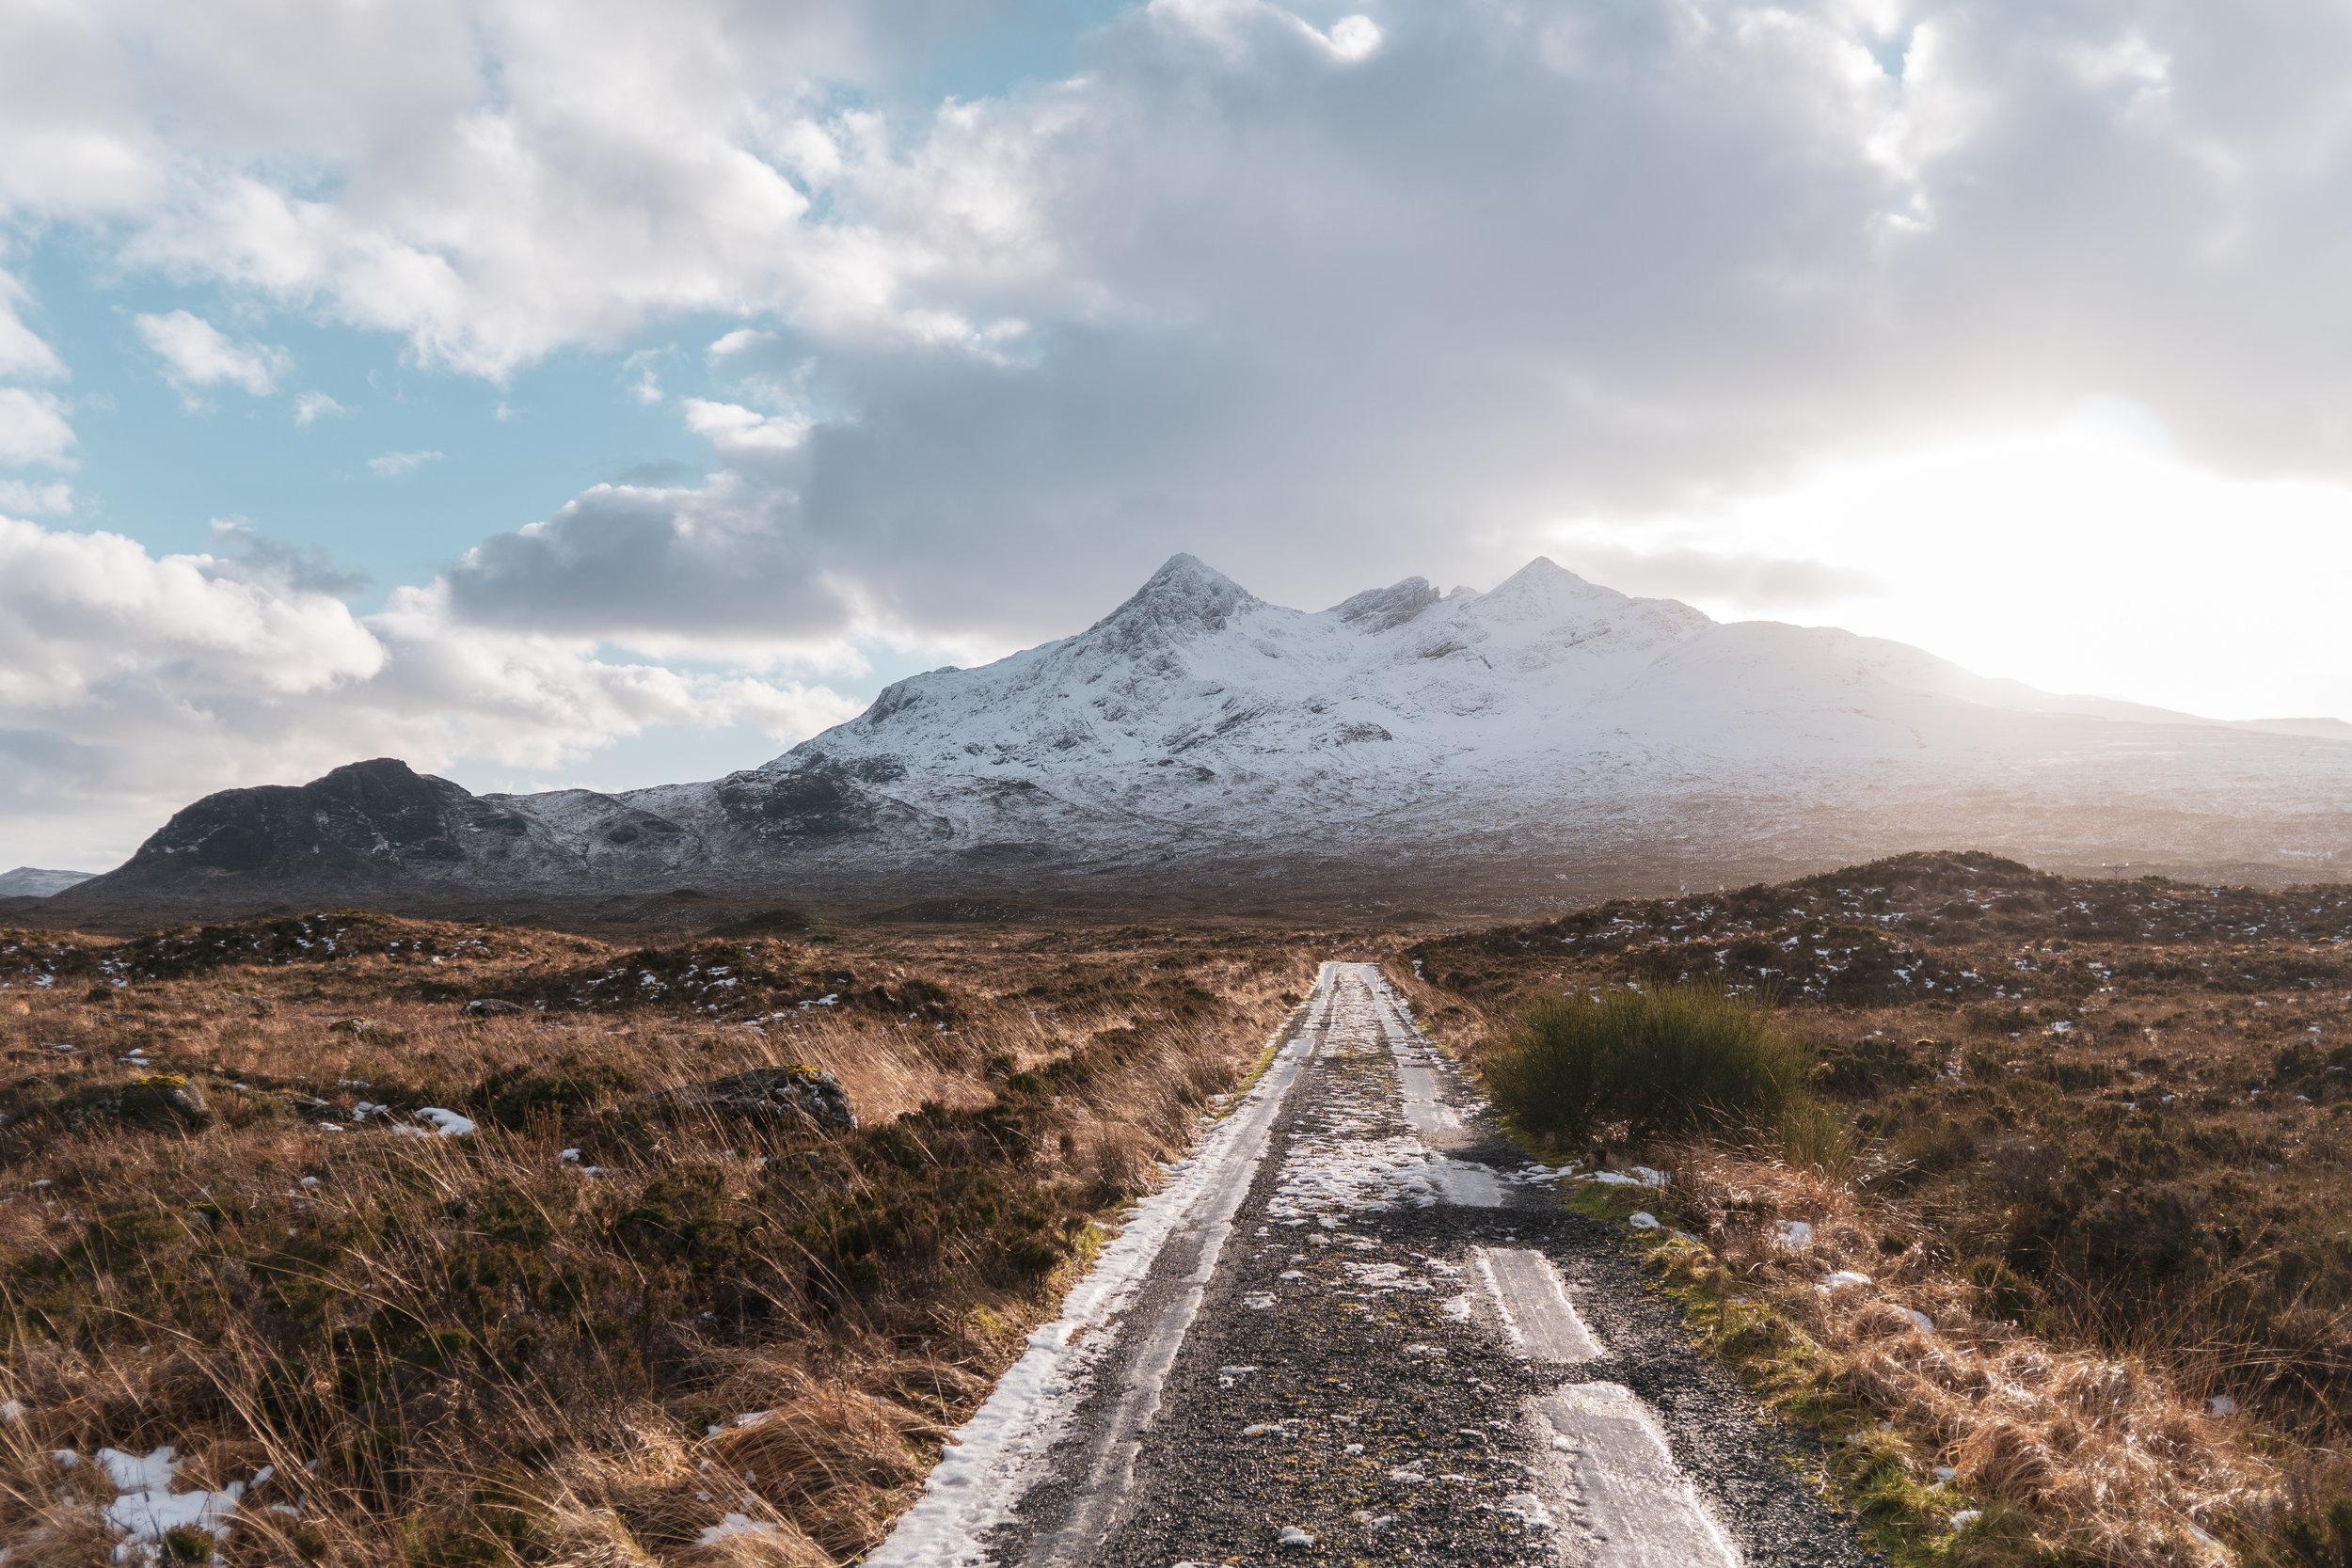 Isle-of-Skye-Fairy-Glen-und-Braes (29).jpg